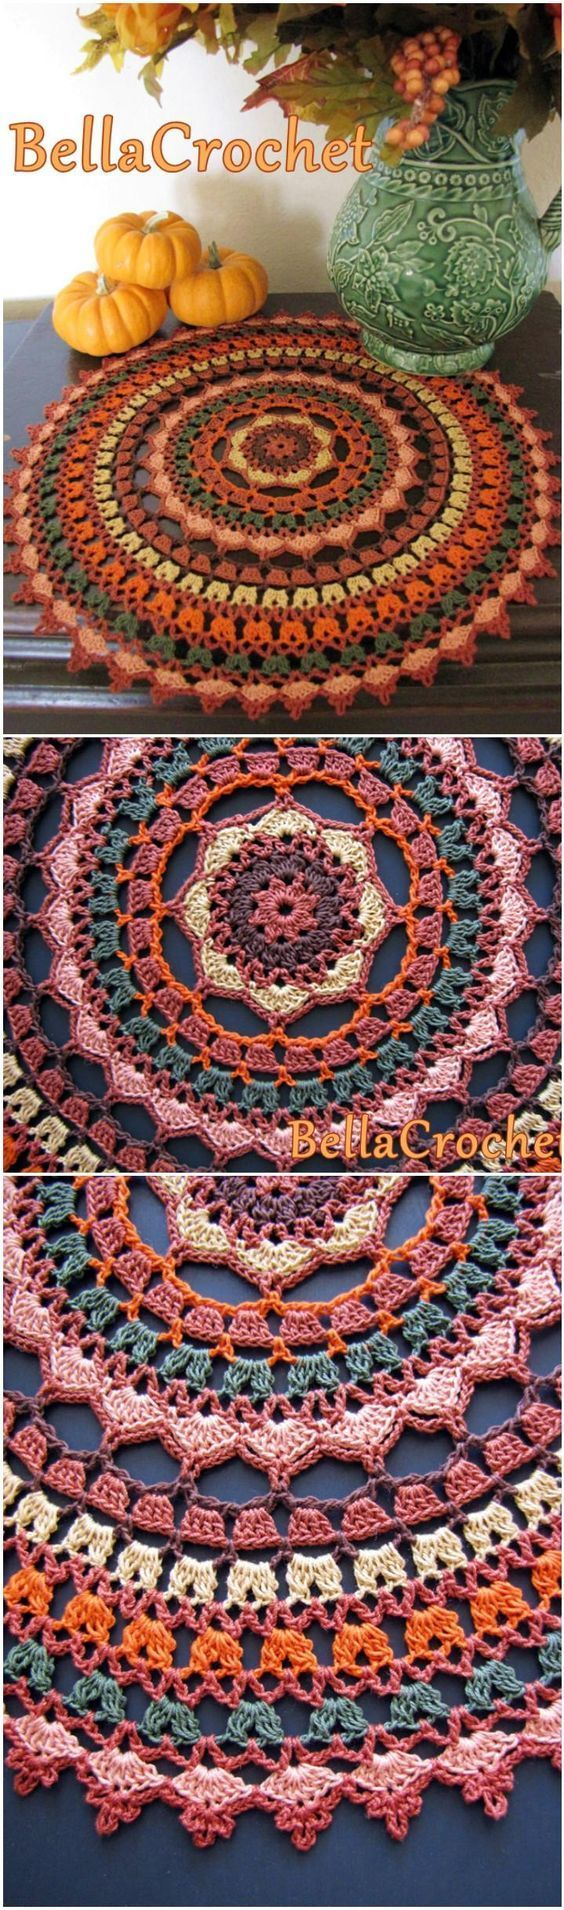 Crochet Autumn Spice Mandala Doily - 60+ Free Crochet Mandala ...